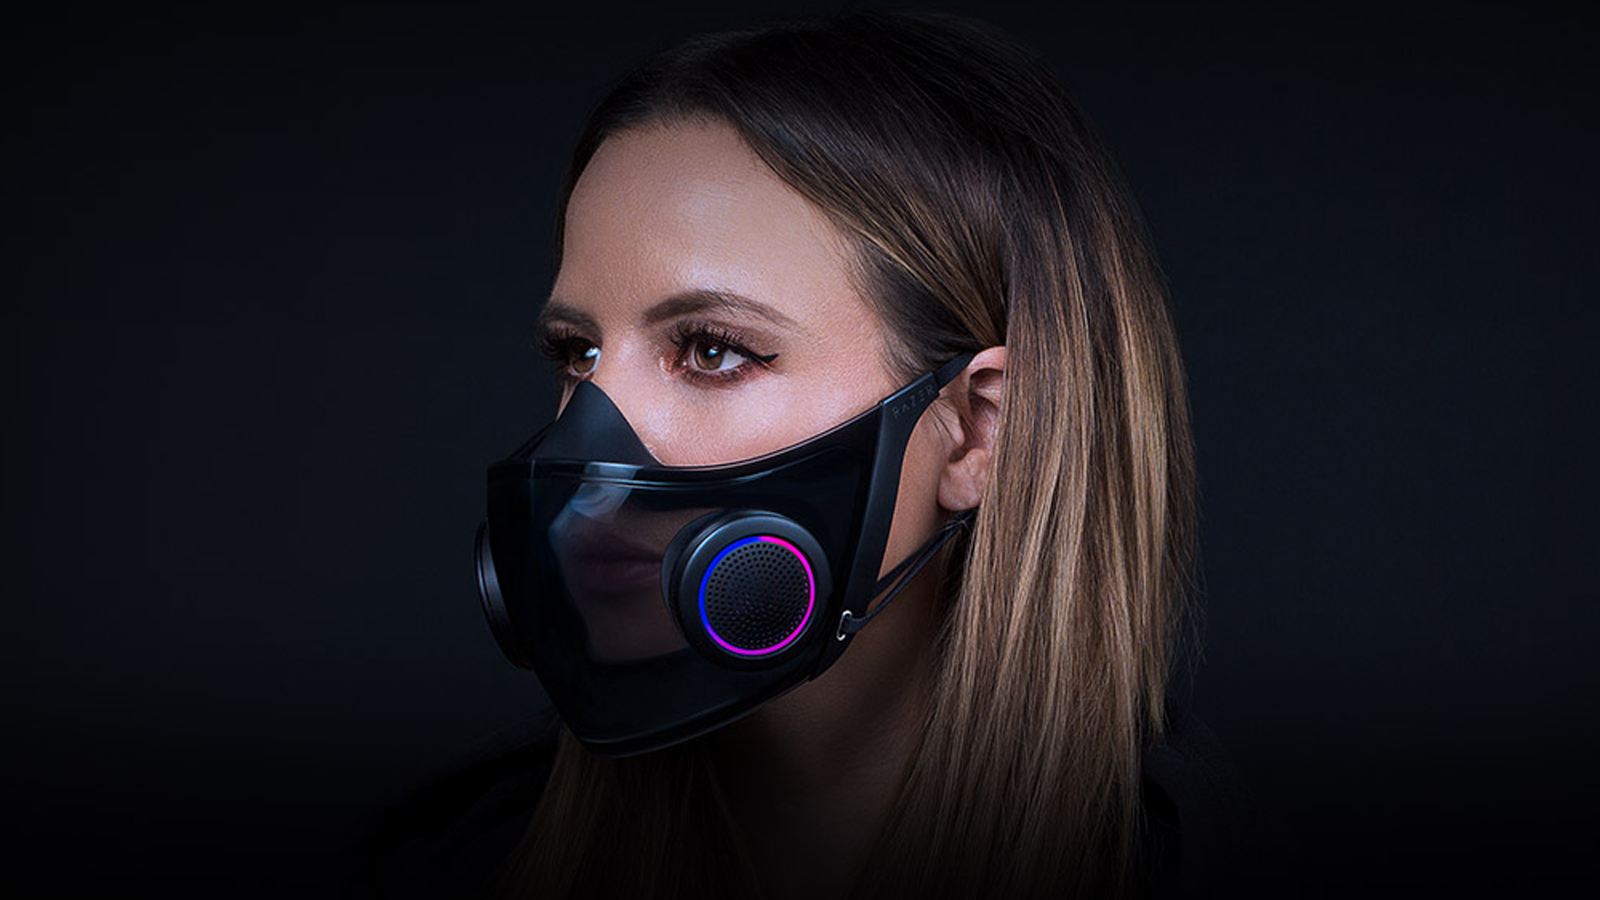 The Razer Project Hazel face mask.